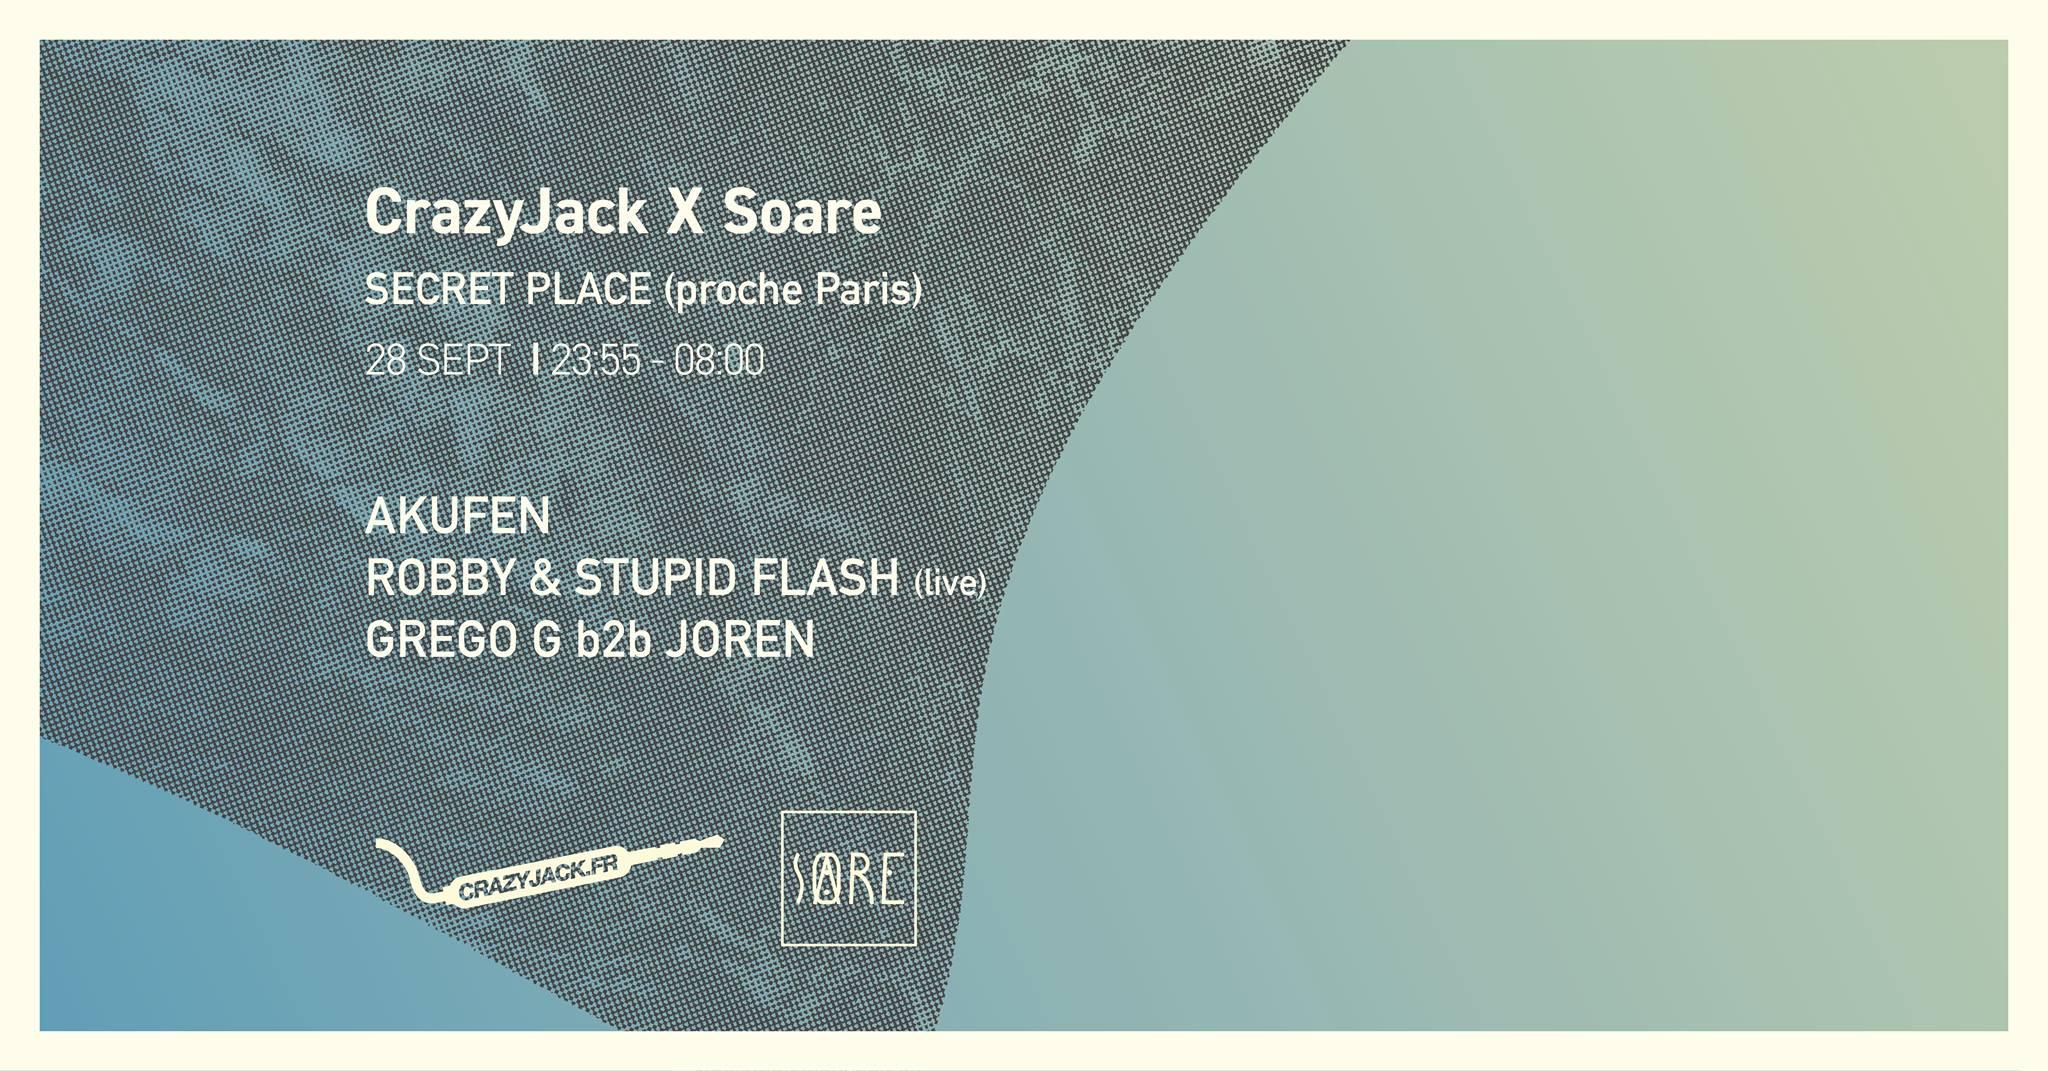 CrazyJack x Soare : Akufen, Robby & Stupid Flash live & more